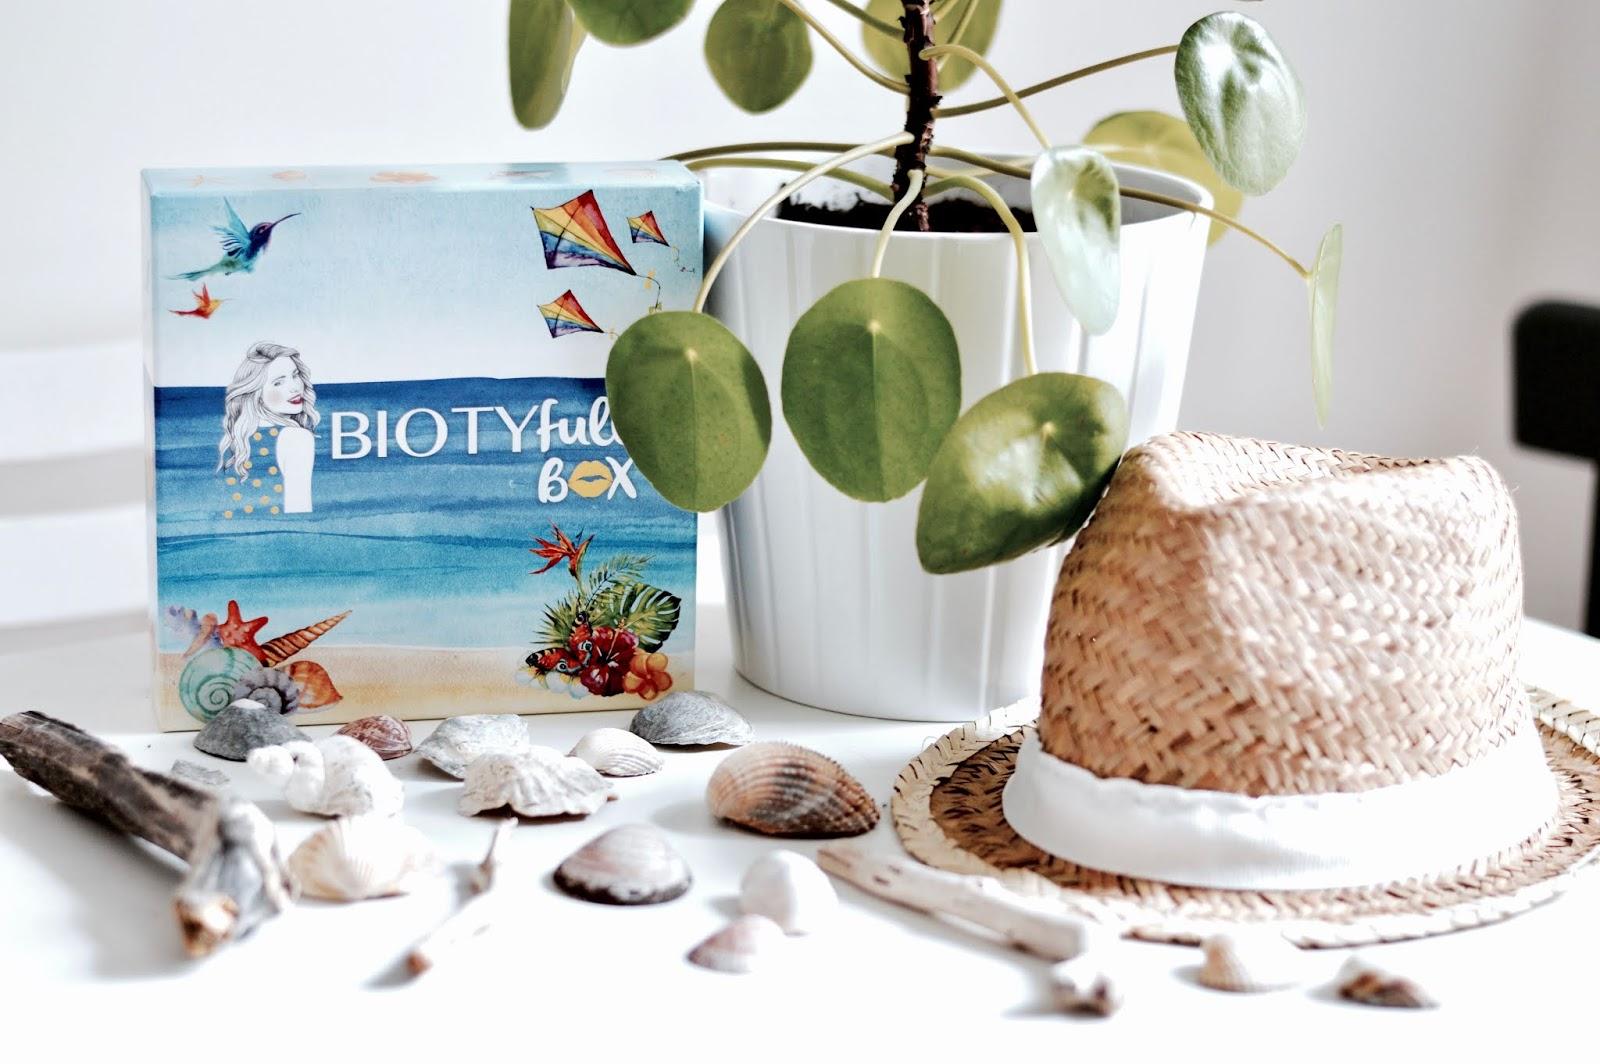 Biotyfull box, la box beauté bio !